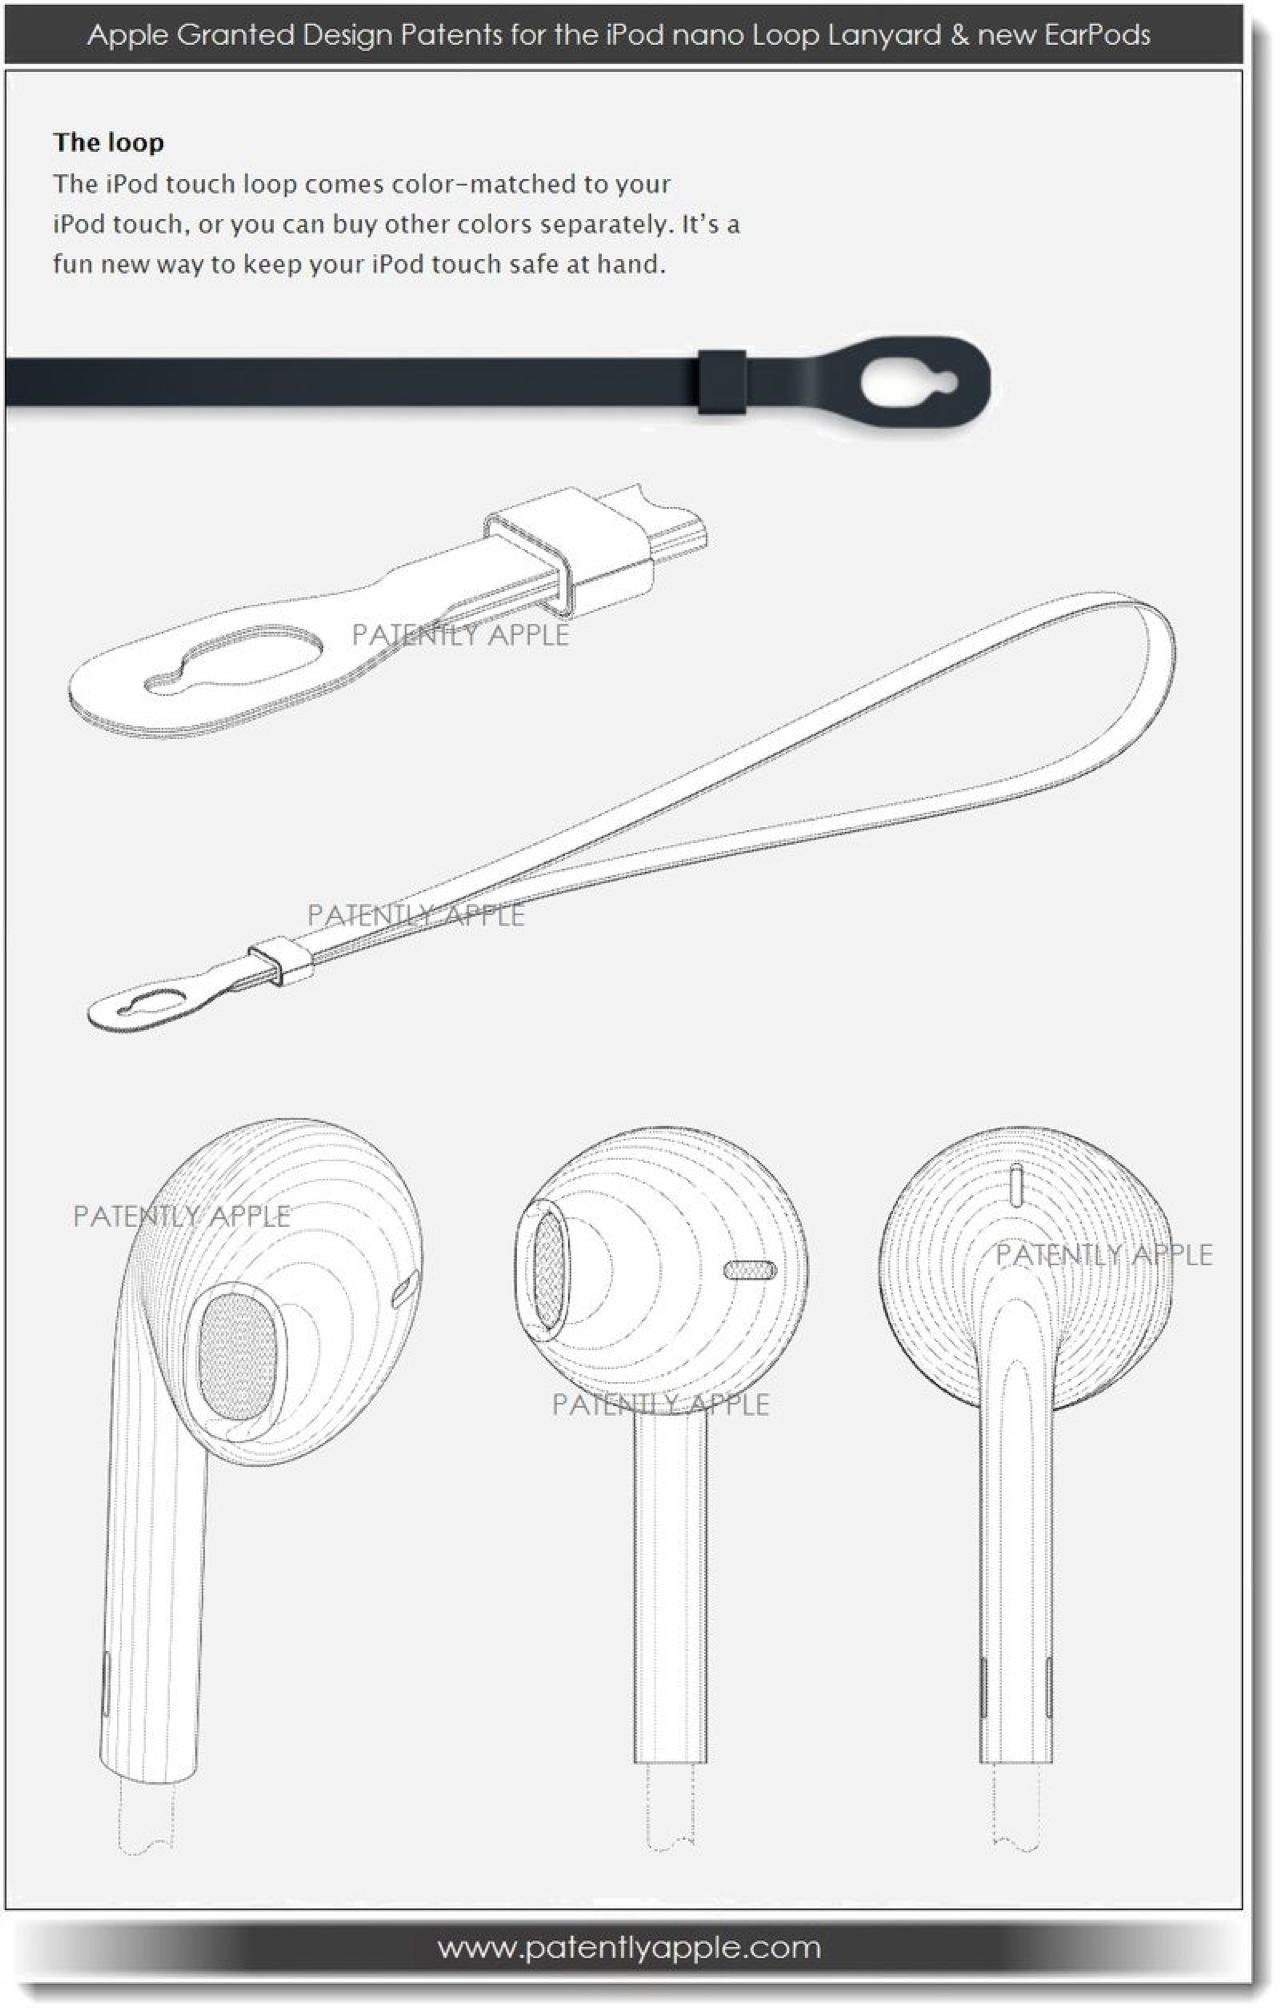 Apple Wins Design Patents For 7th Generation iPod Nano